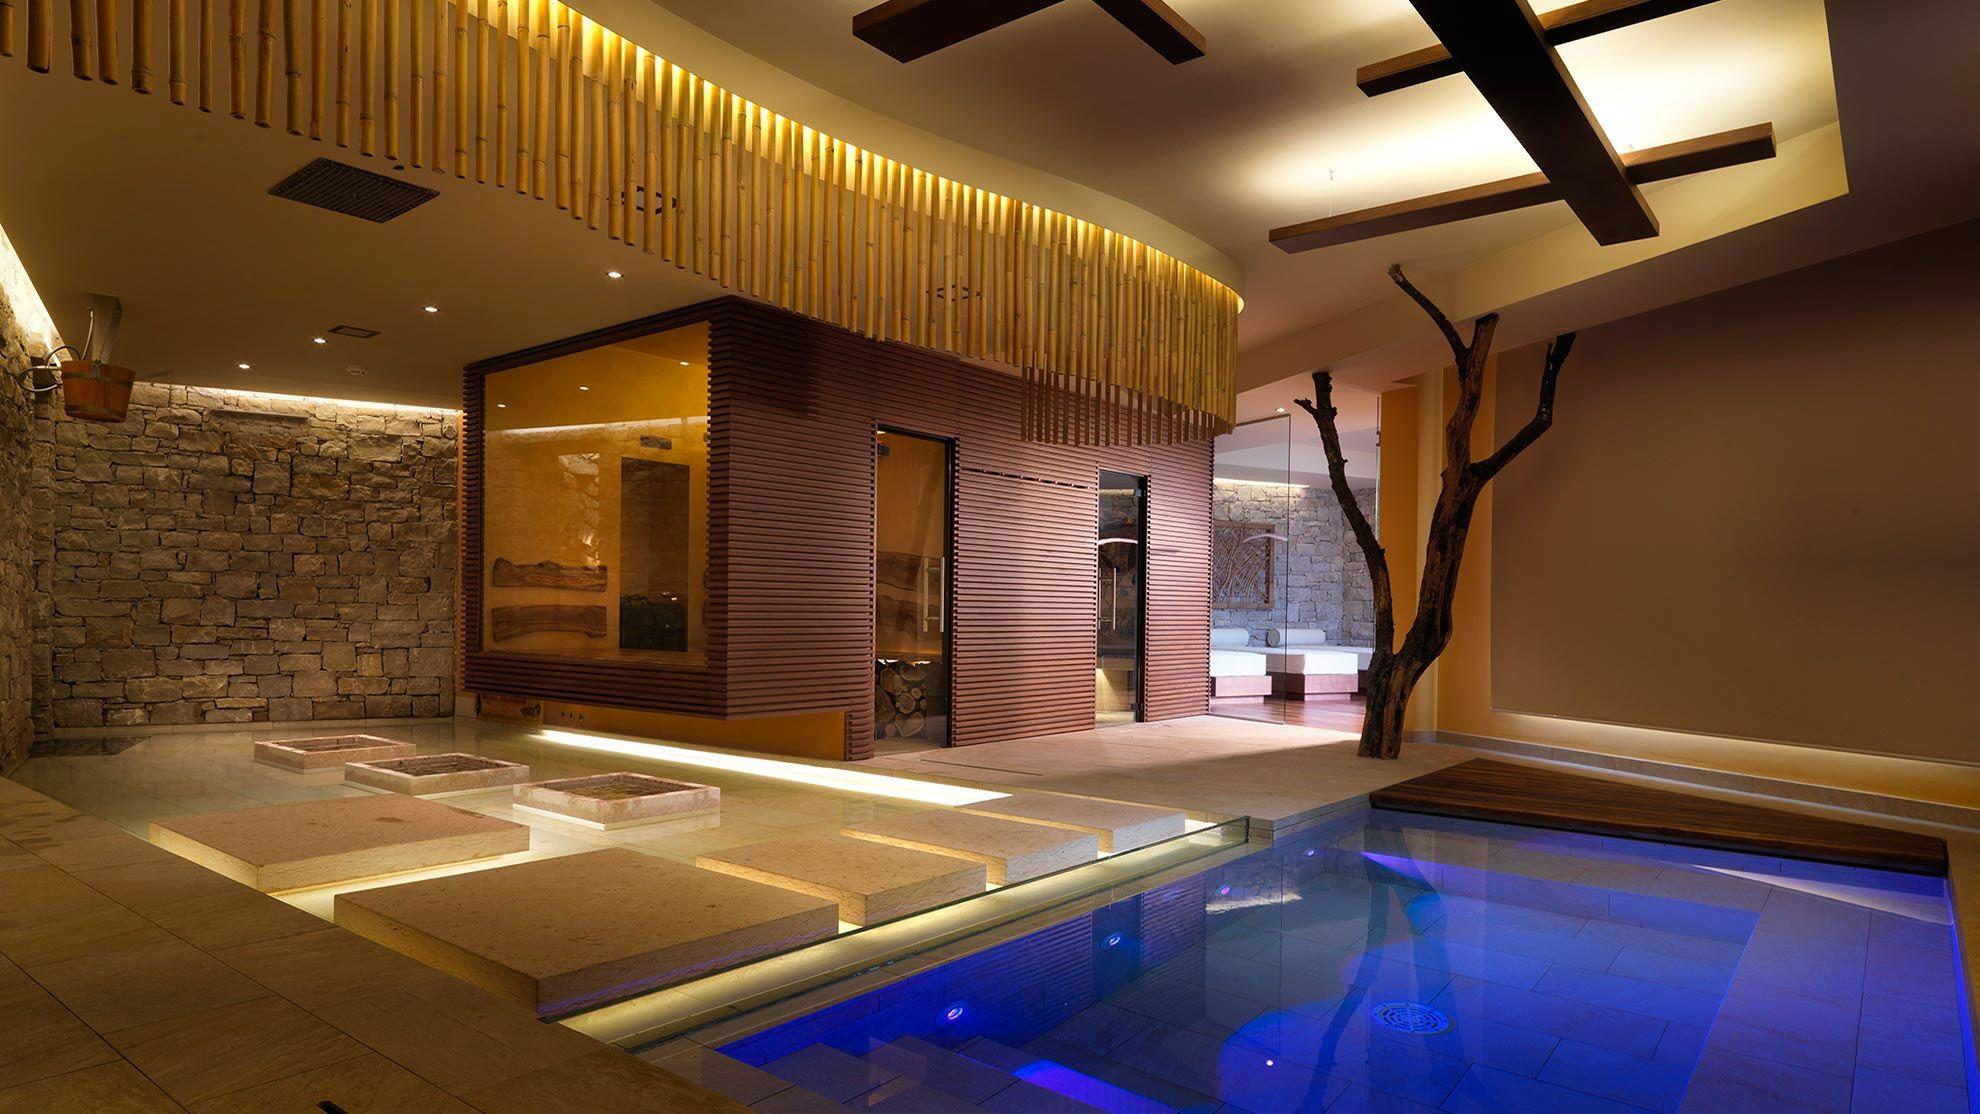 Wellness & SPA design - Guarda i progetti | Alberto Apostoli ...